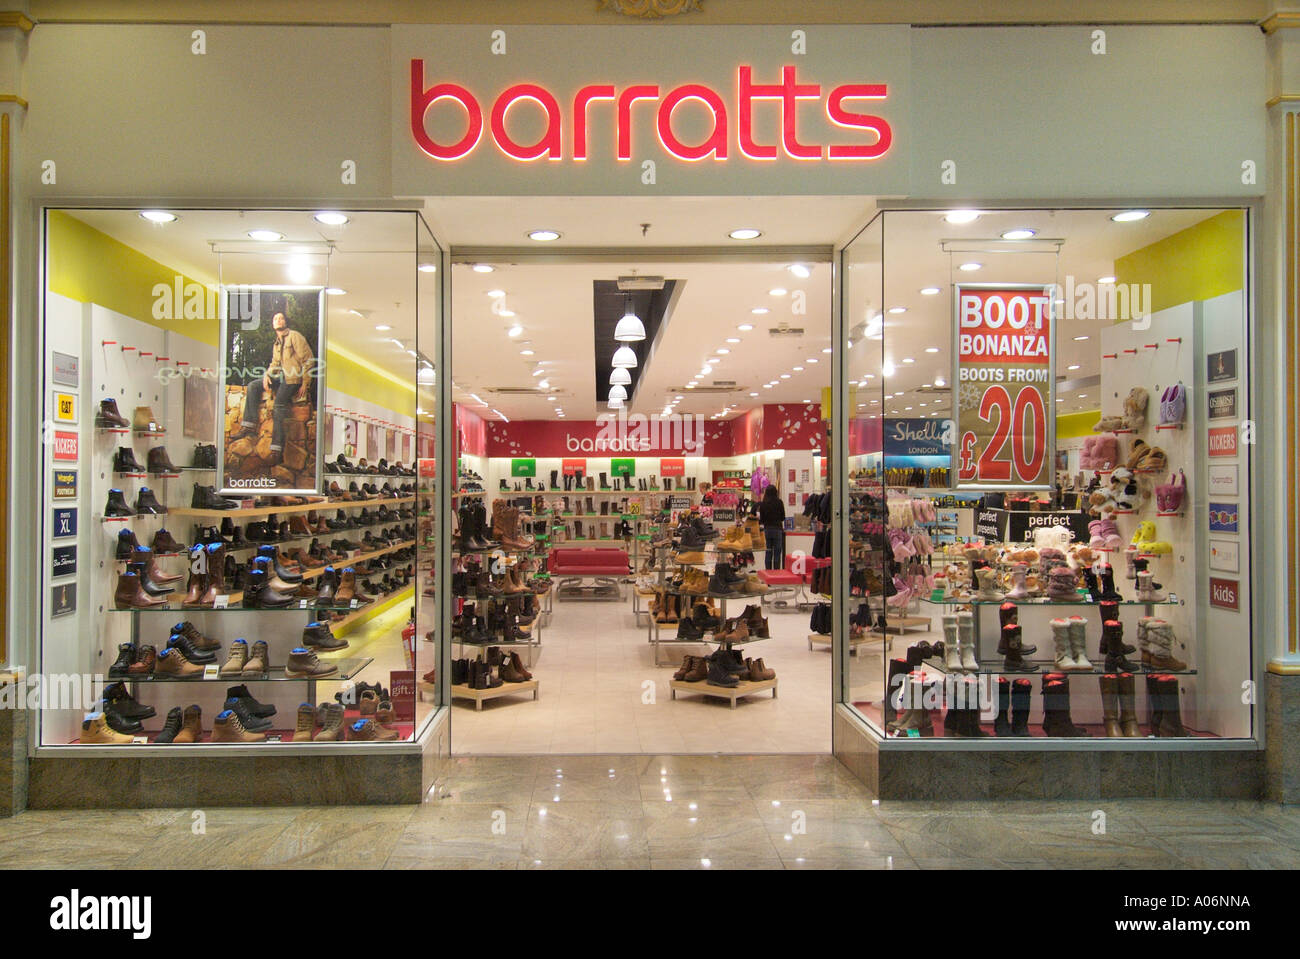 Barratts shop store Trafford Centre UK Royaume-Uni Angleterre Europe Go Grande-bretagne Union Européenne UE Banque D'Images